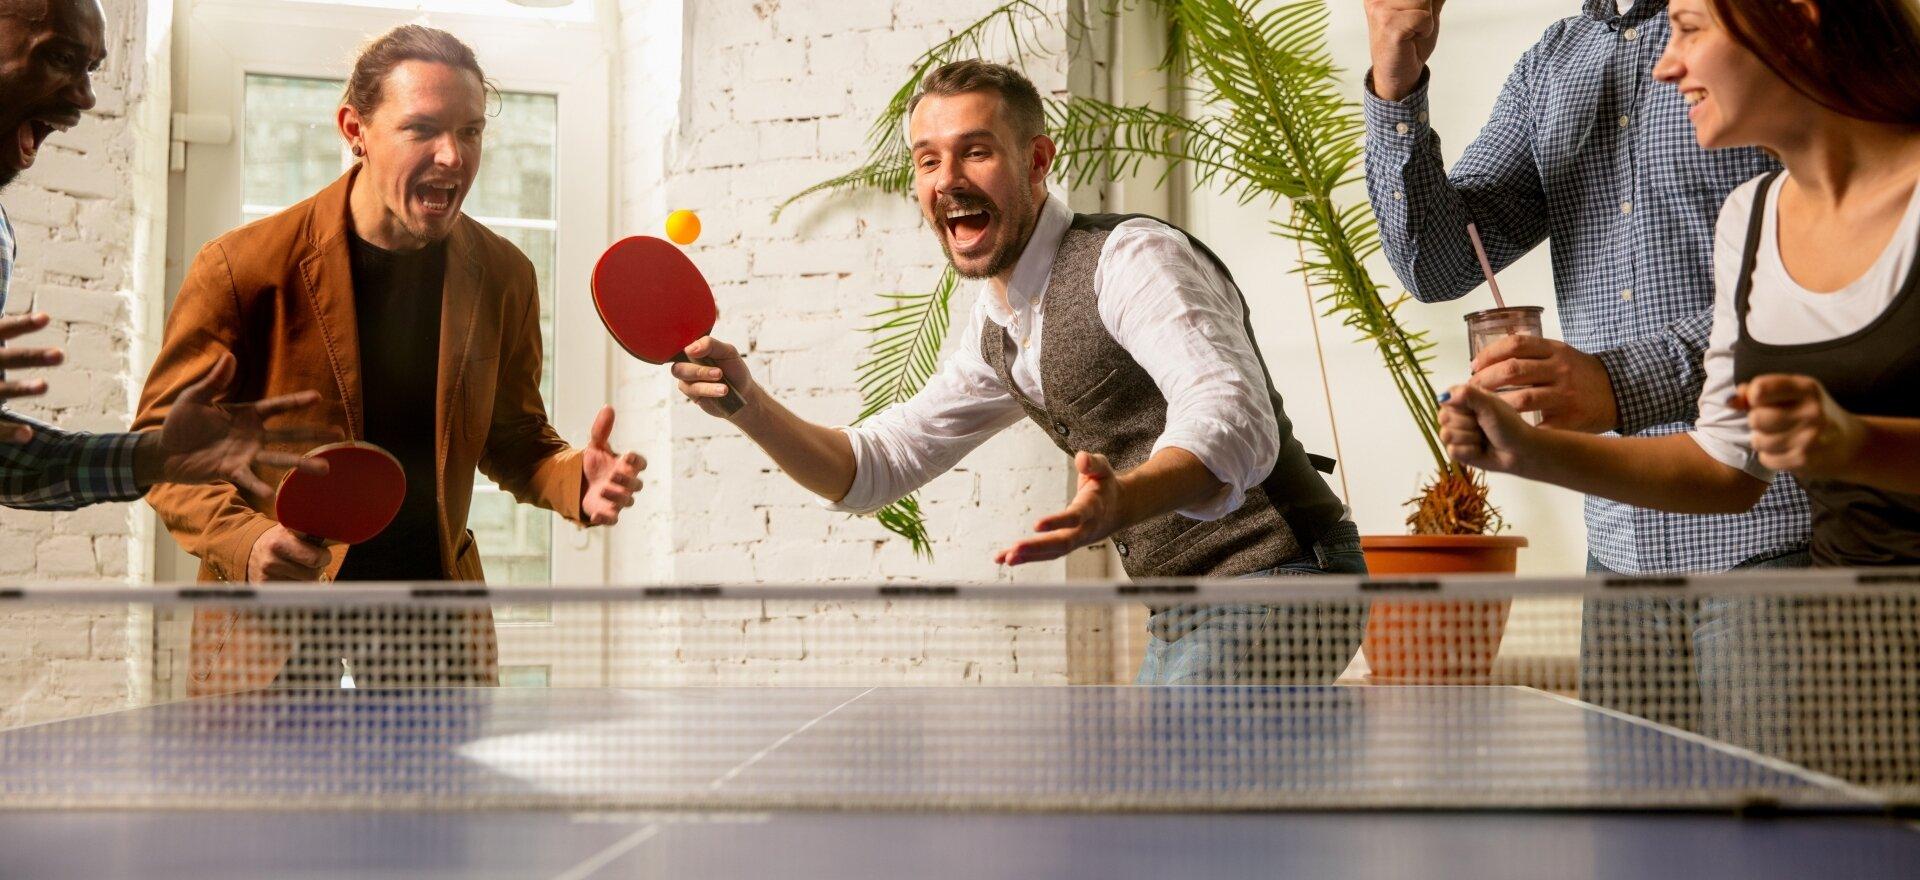 Ping-Pong Bajnokság